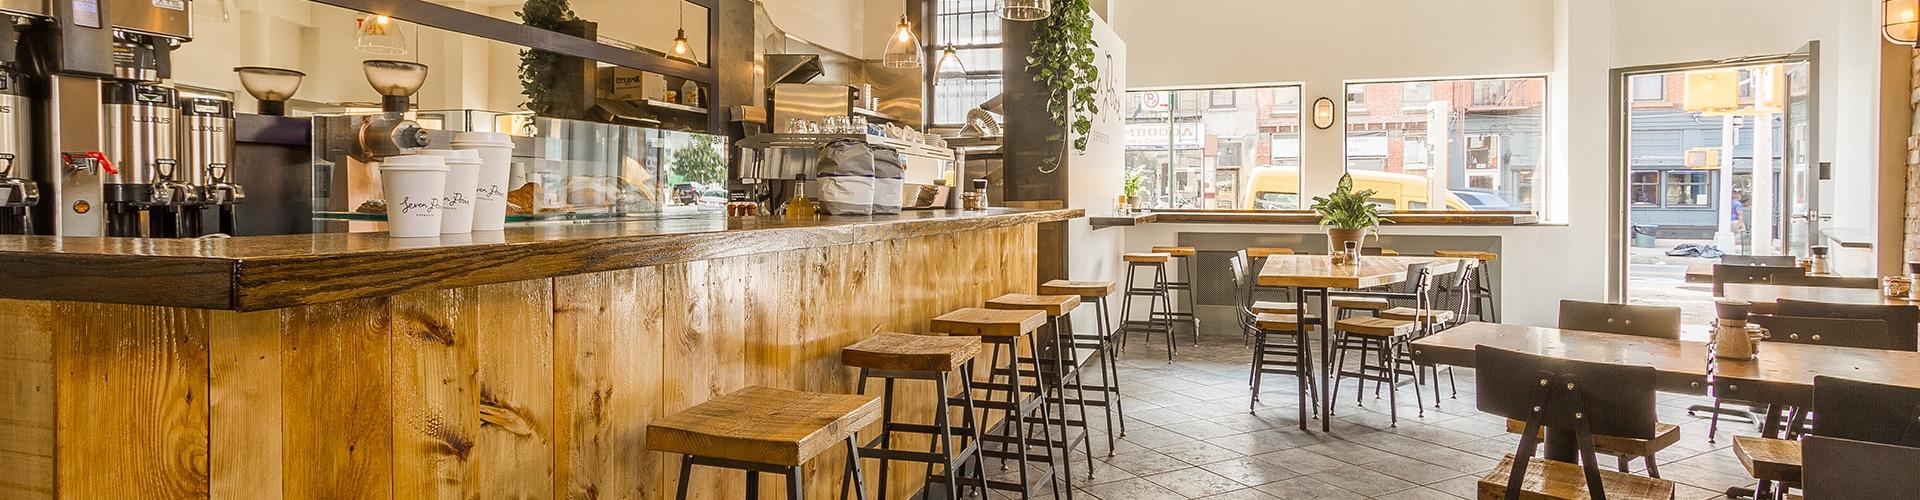 Top 5: Aussie Coffee Shops